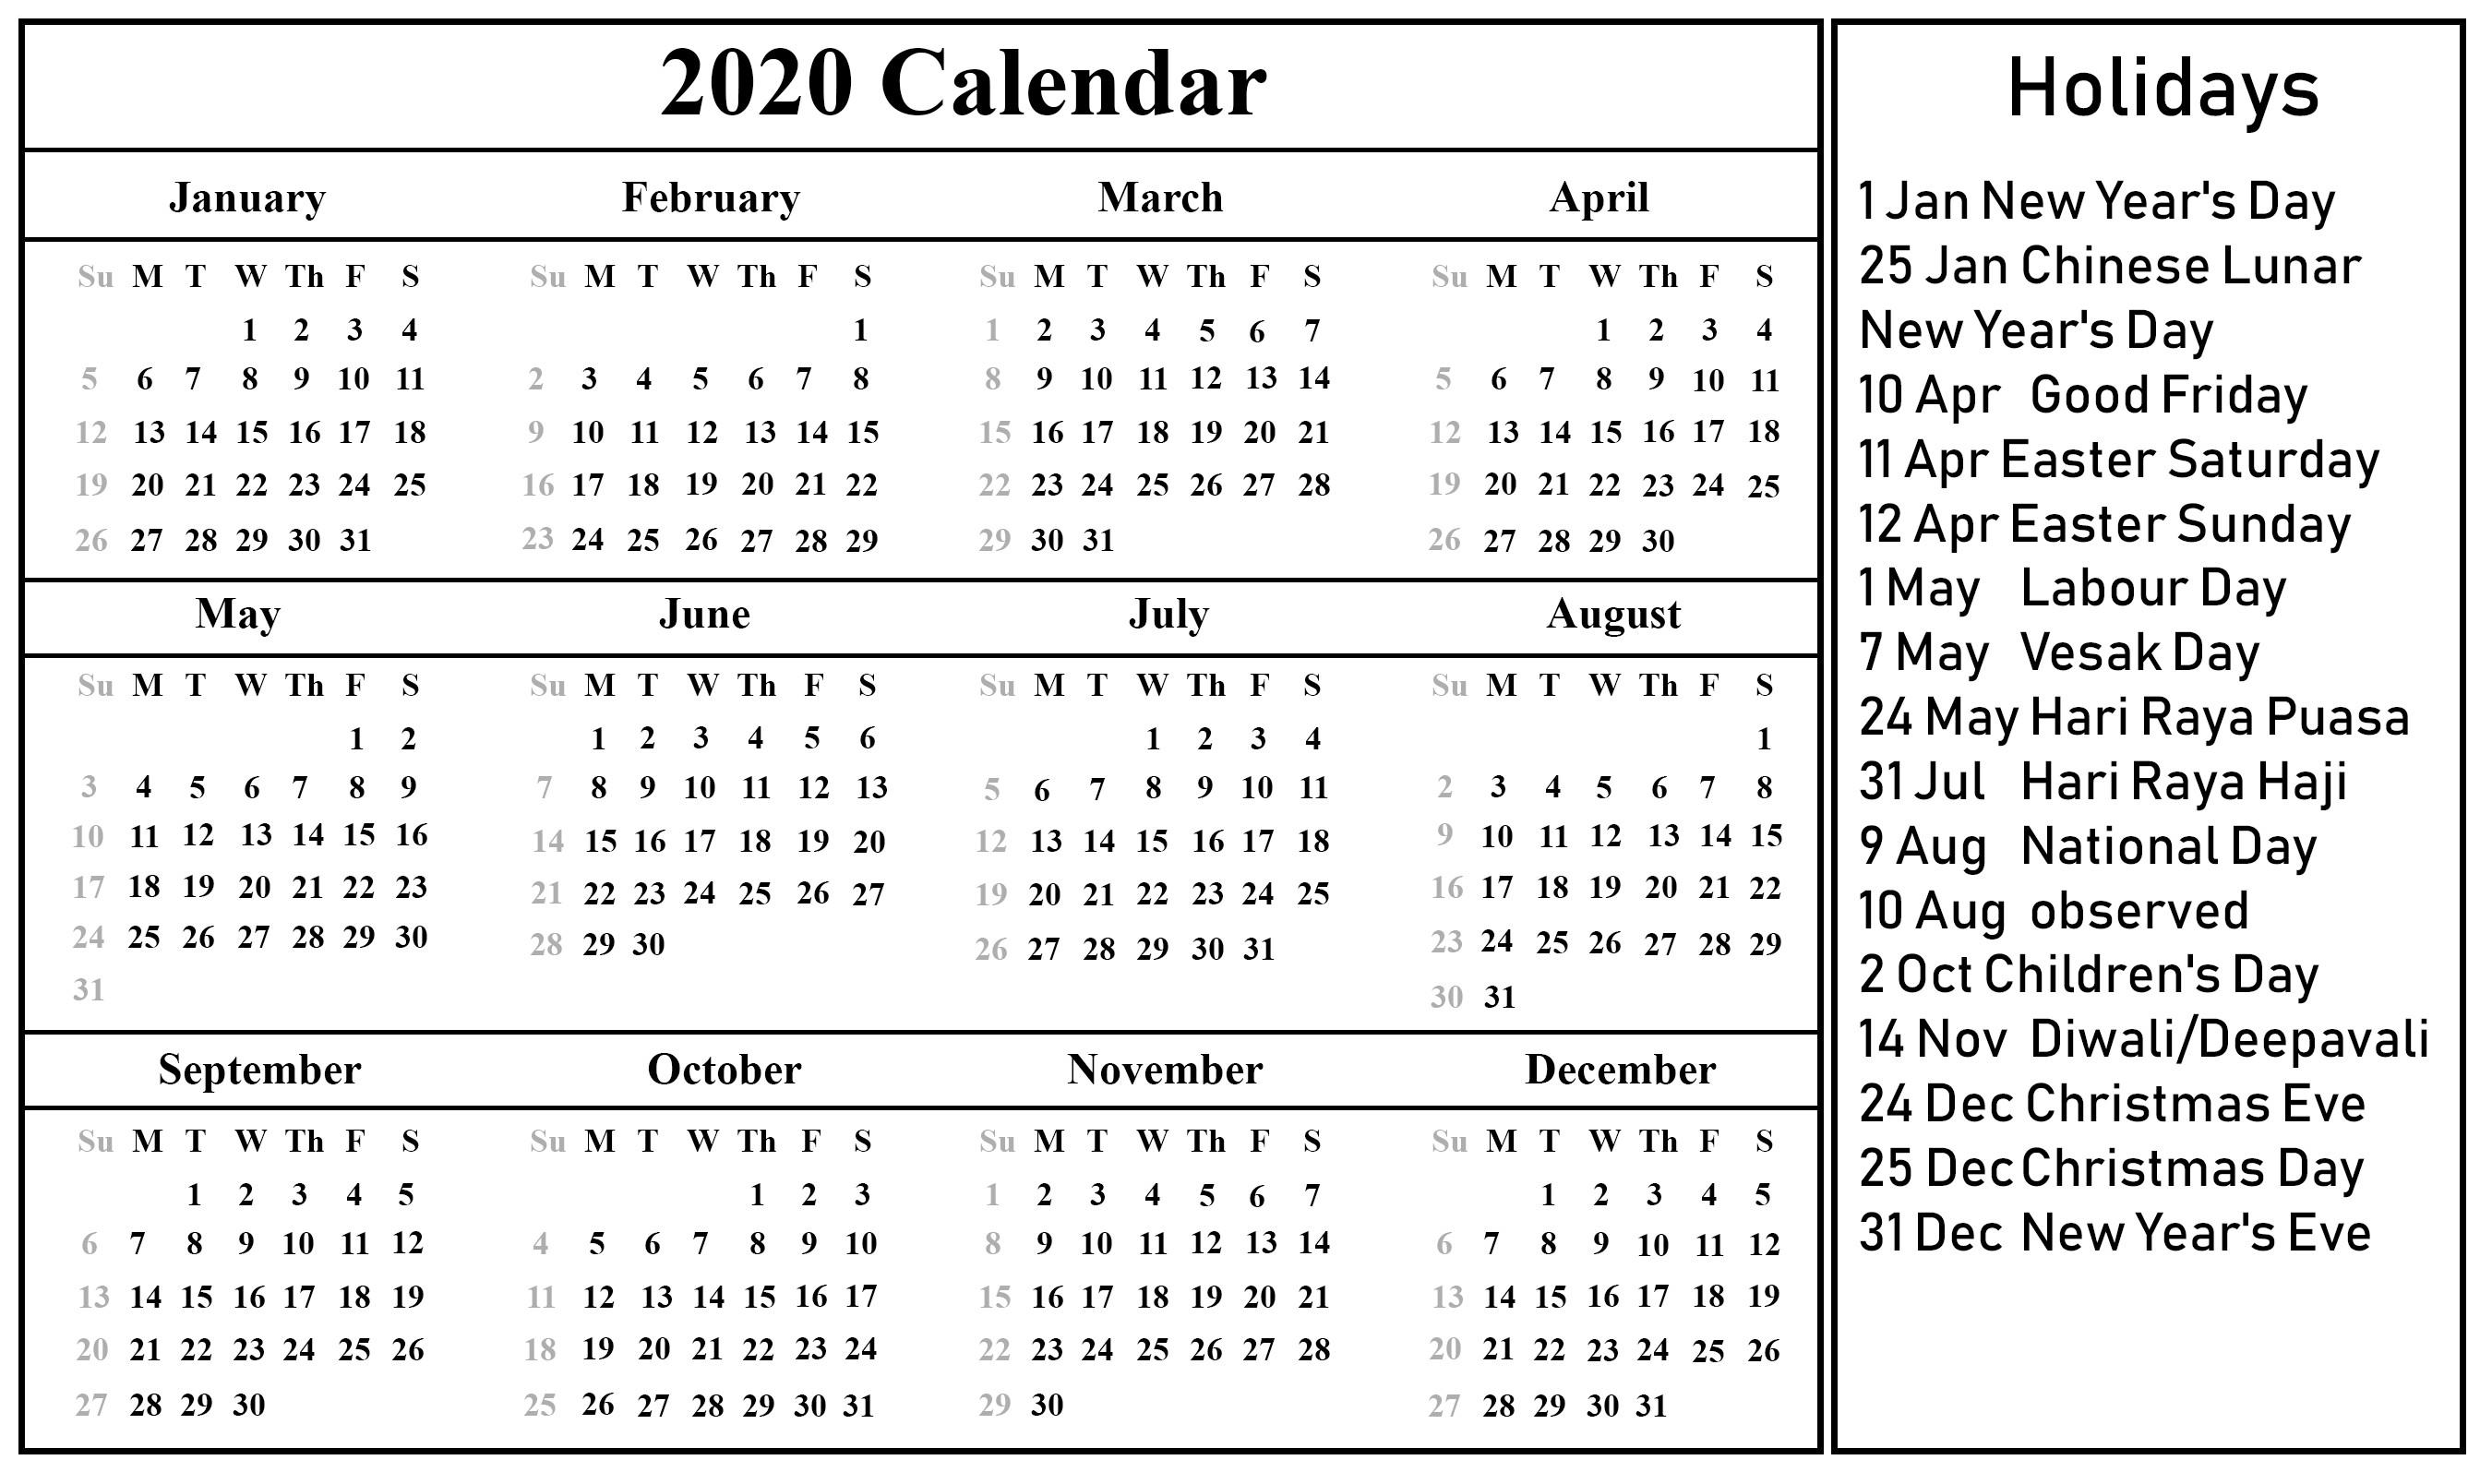 Free Printable 2020 Calendar with Holidays Free Printable Singapore Calendar 2020 Pdf Excel & Word